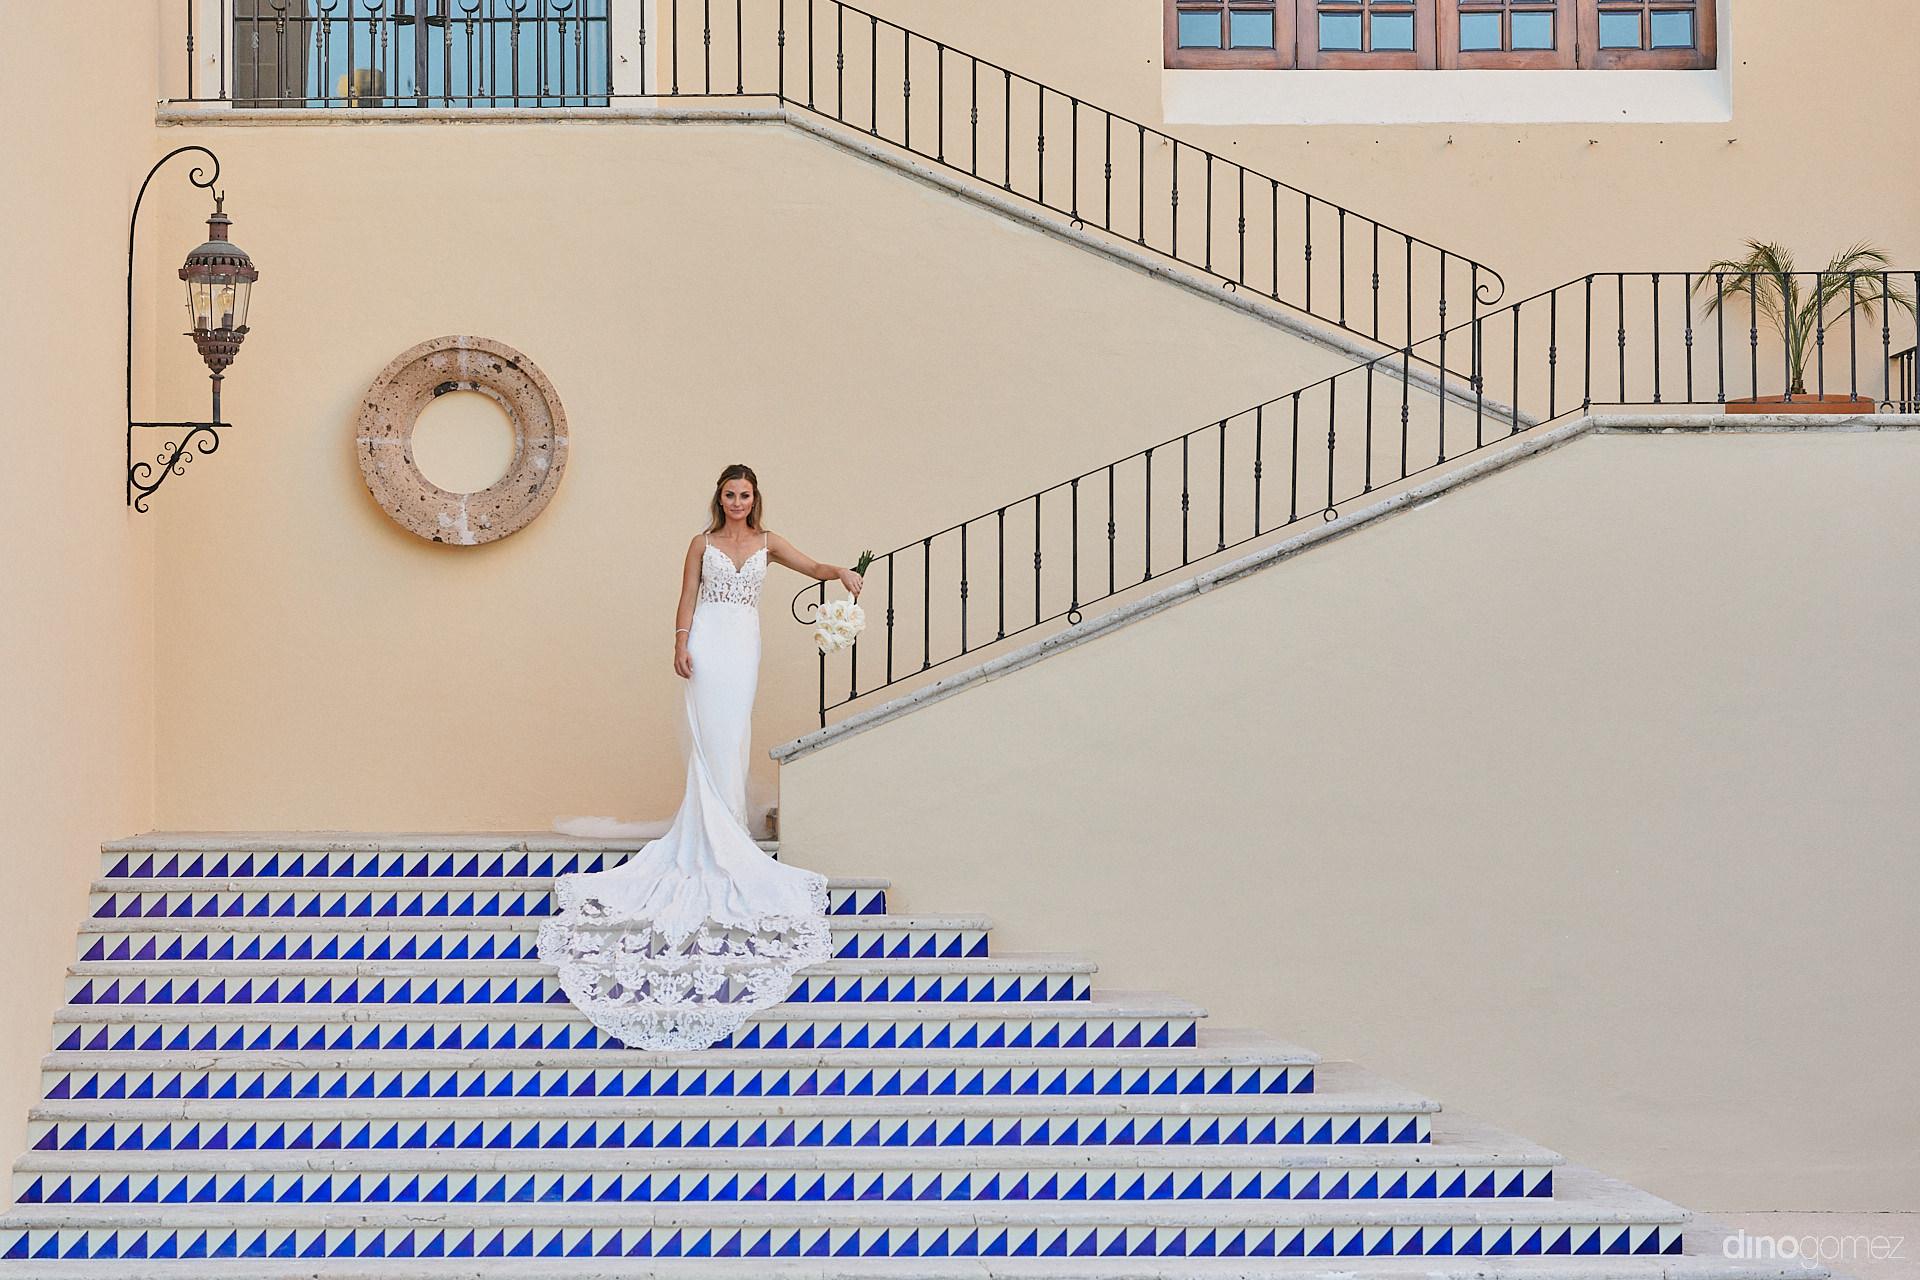 Wedding Planners Cabo San Lucas - Luxury Wedding Photographer In Cabo Dino Gomez - C&T